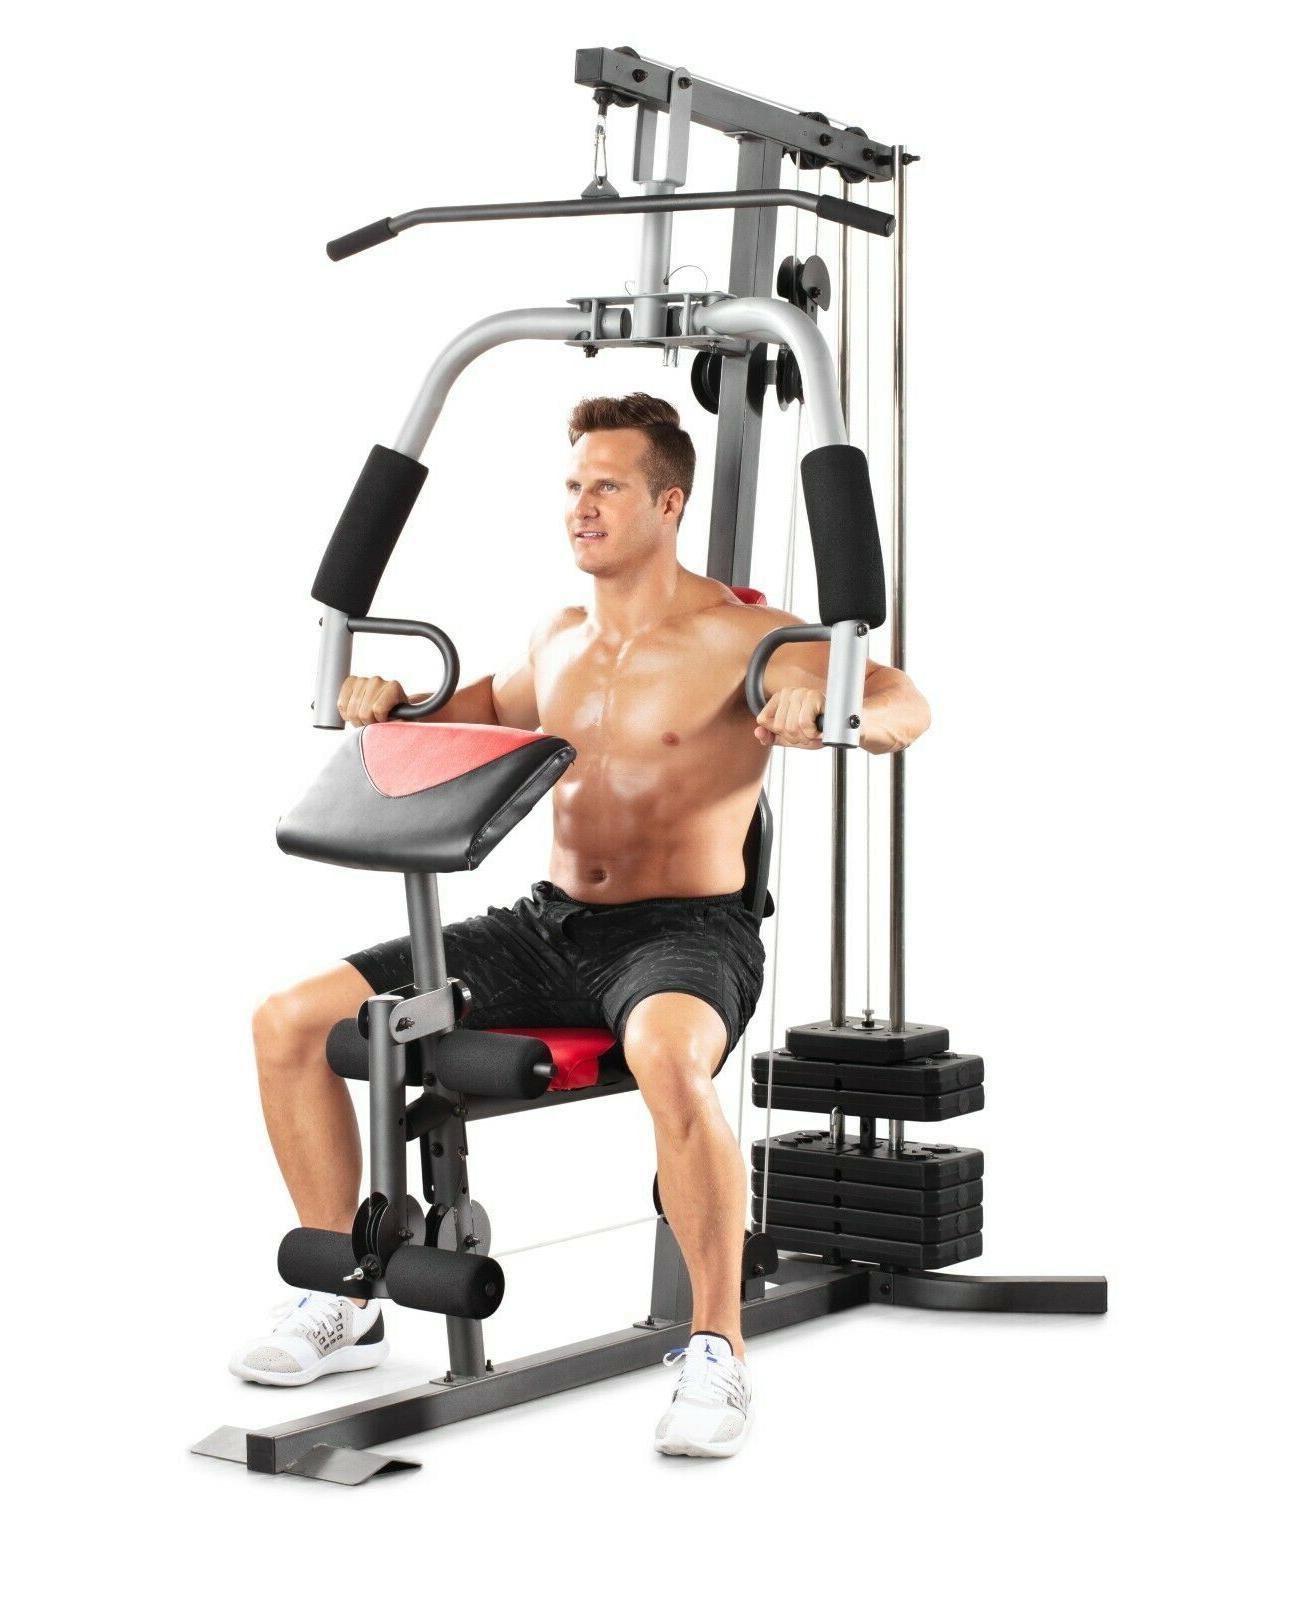 Weider 2980 Gym Chest Pad Workout